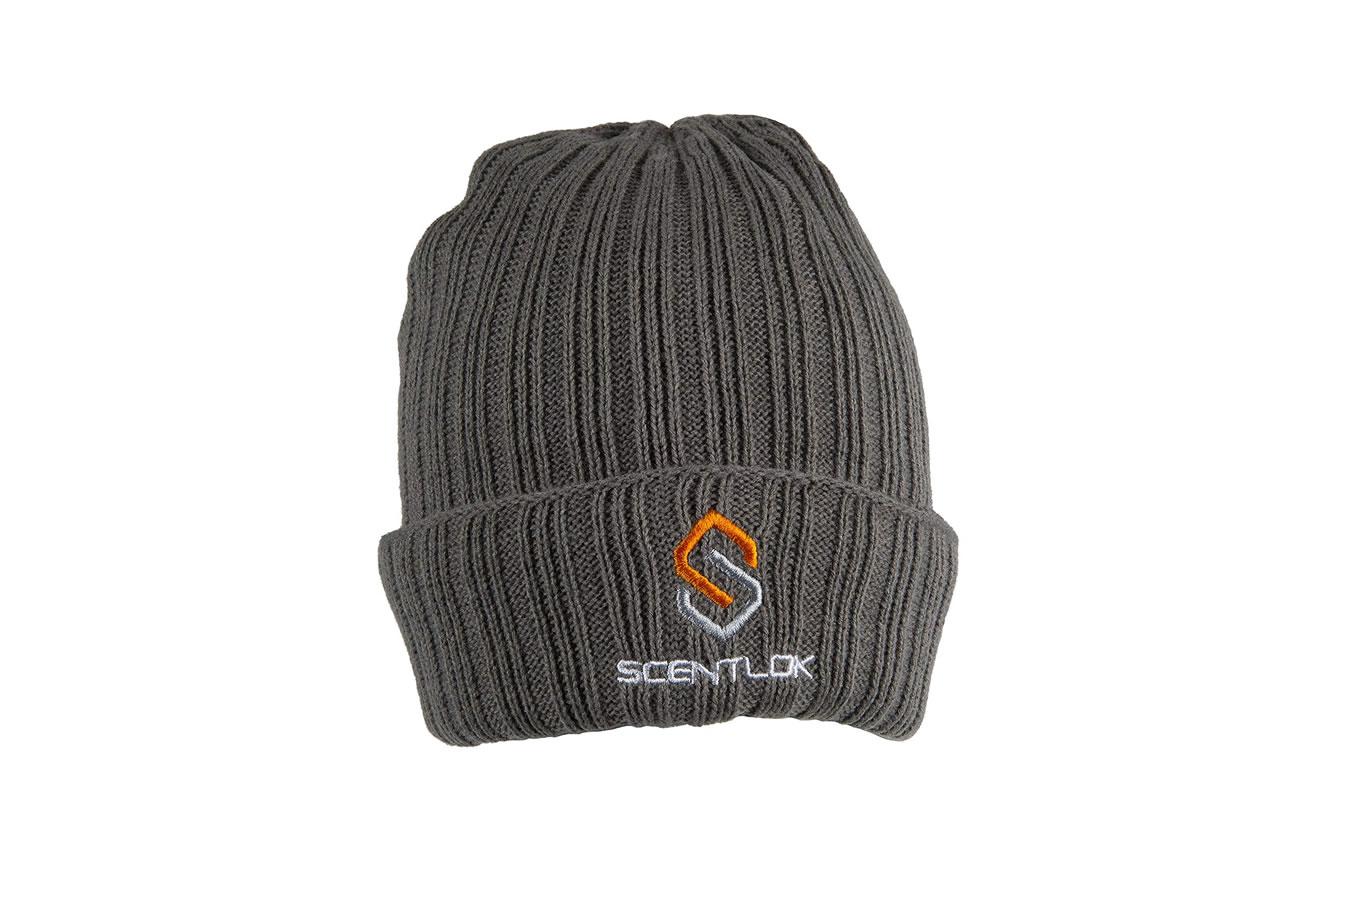 9f1e77f2668 Scentlok Carbon Alloy Knit Cuff Beanie